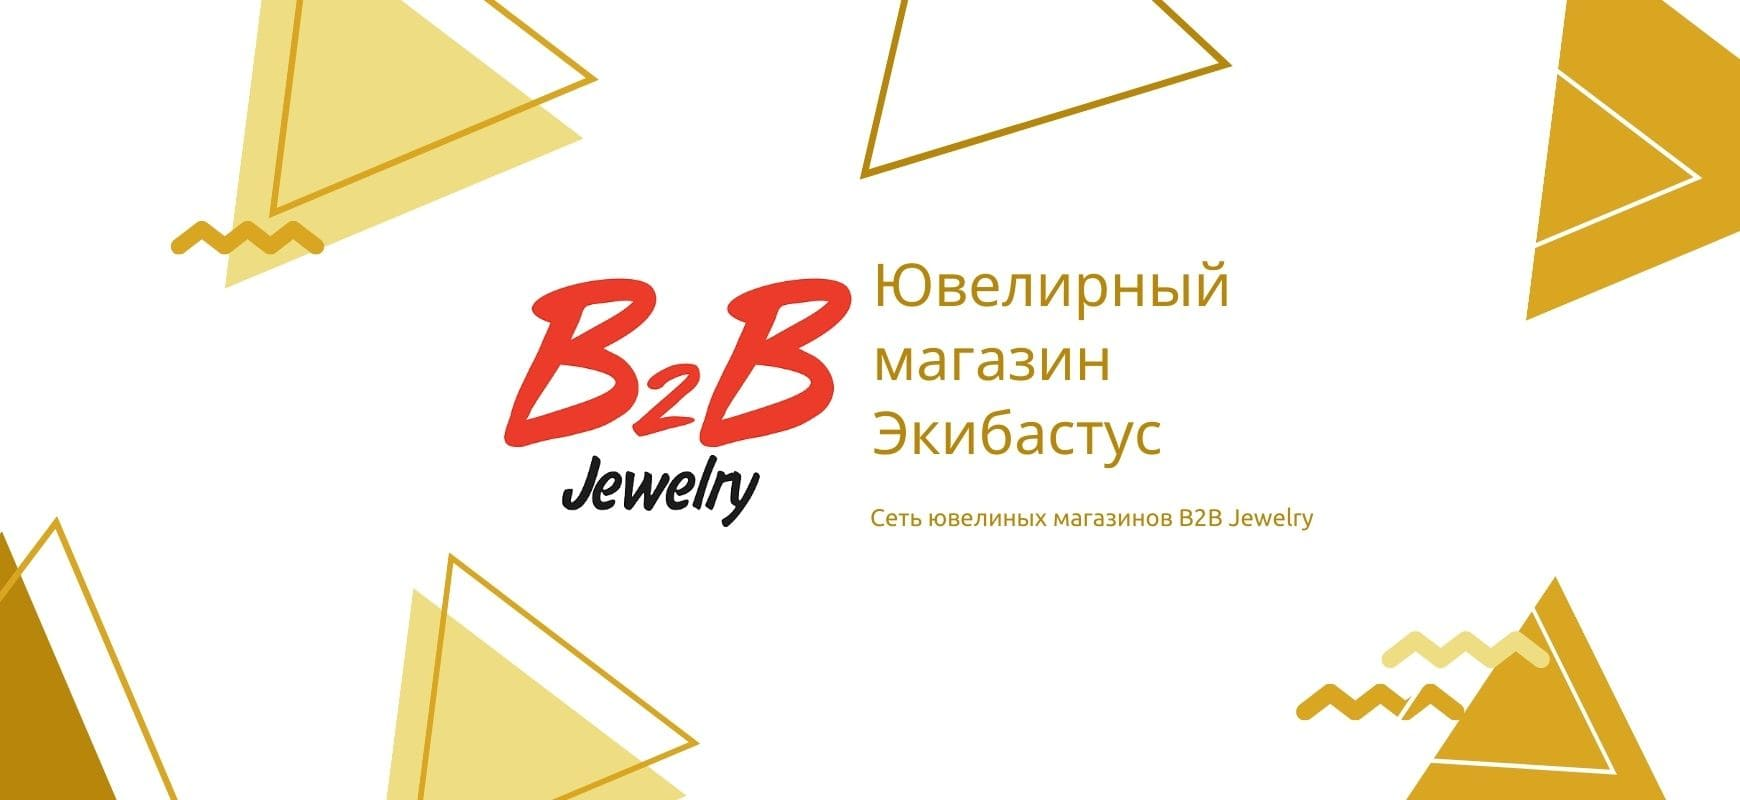 B2B JEWELRY ЭКИБАСТУЗ